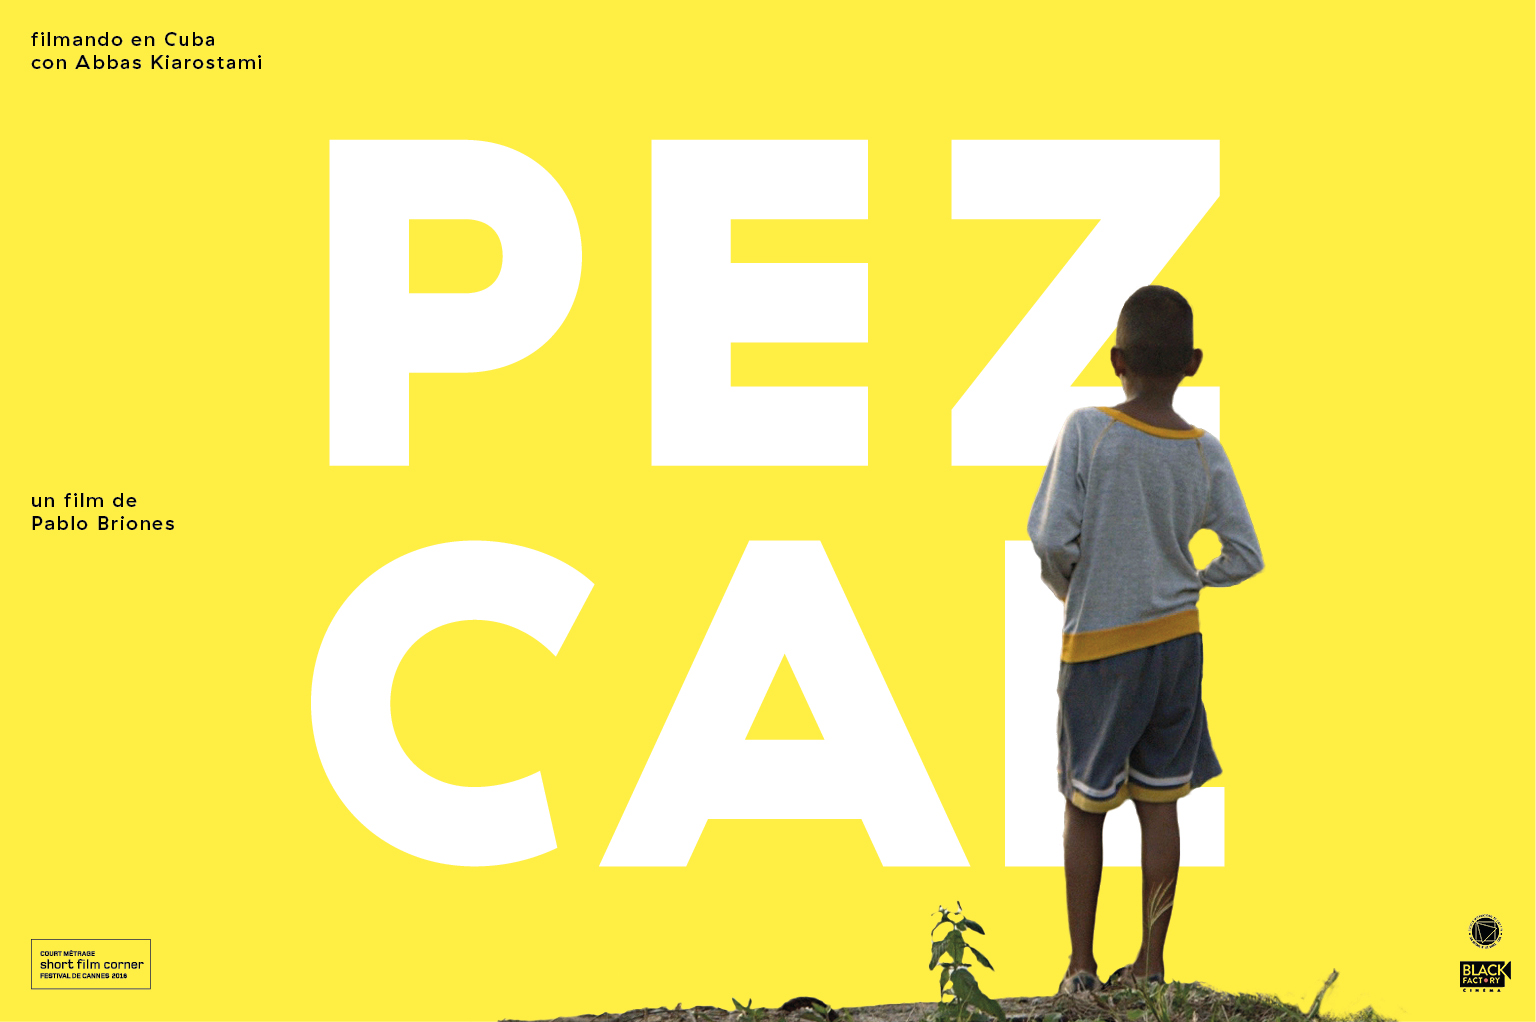 Graphisme Geneve graphic design graphique direction artistique affiche poster swissposter culture culturel promotion film pablo briones kiarostami cuba festival cannes locarno